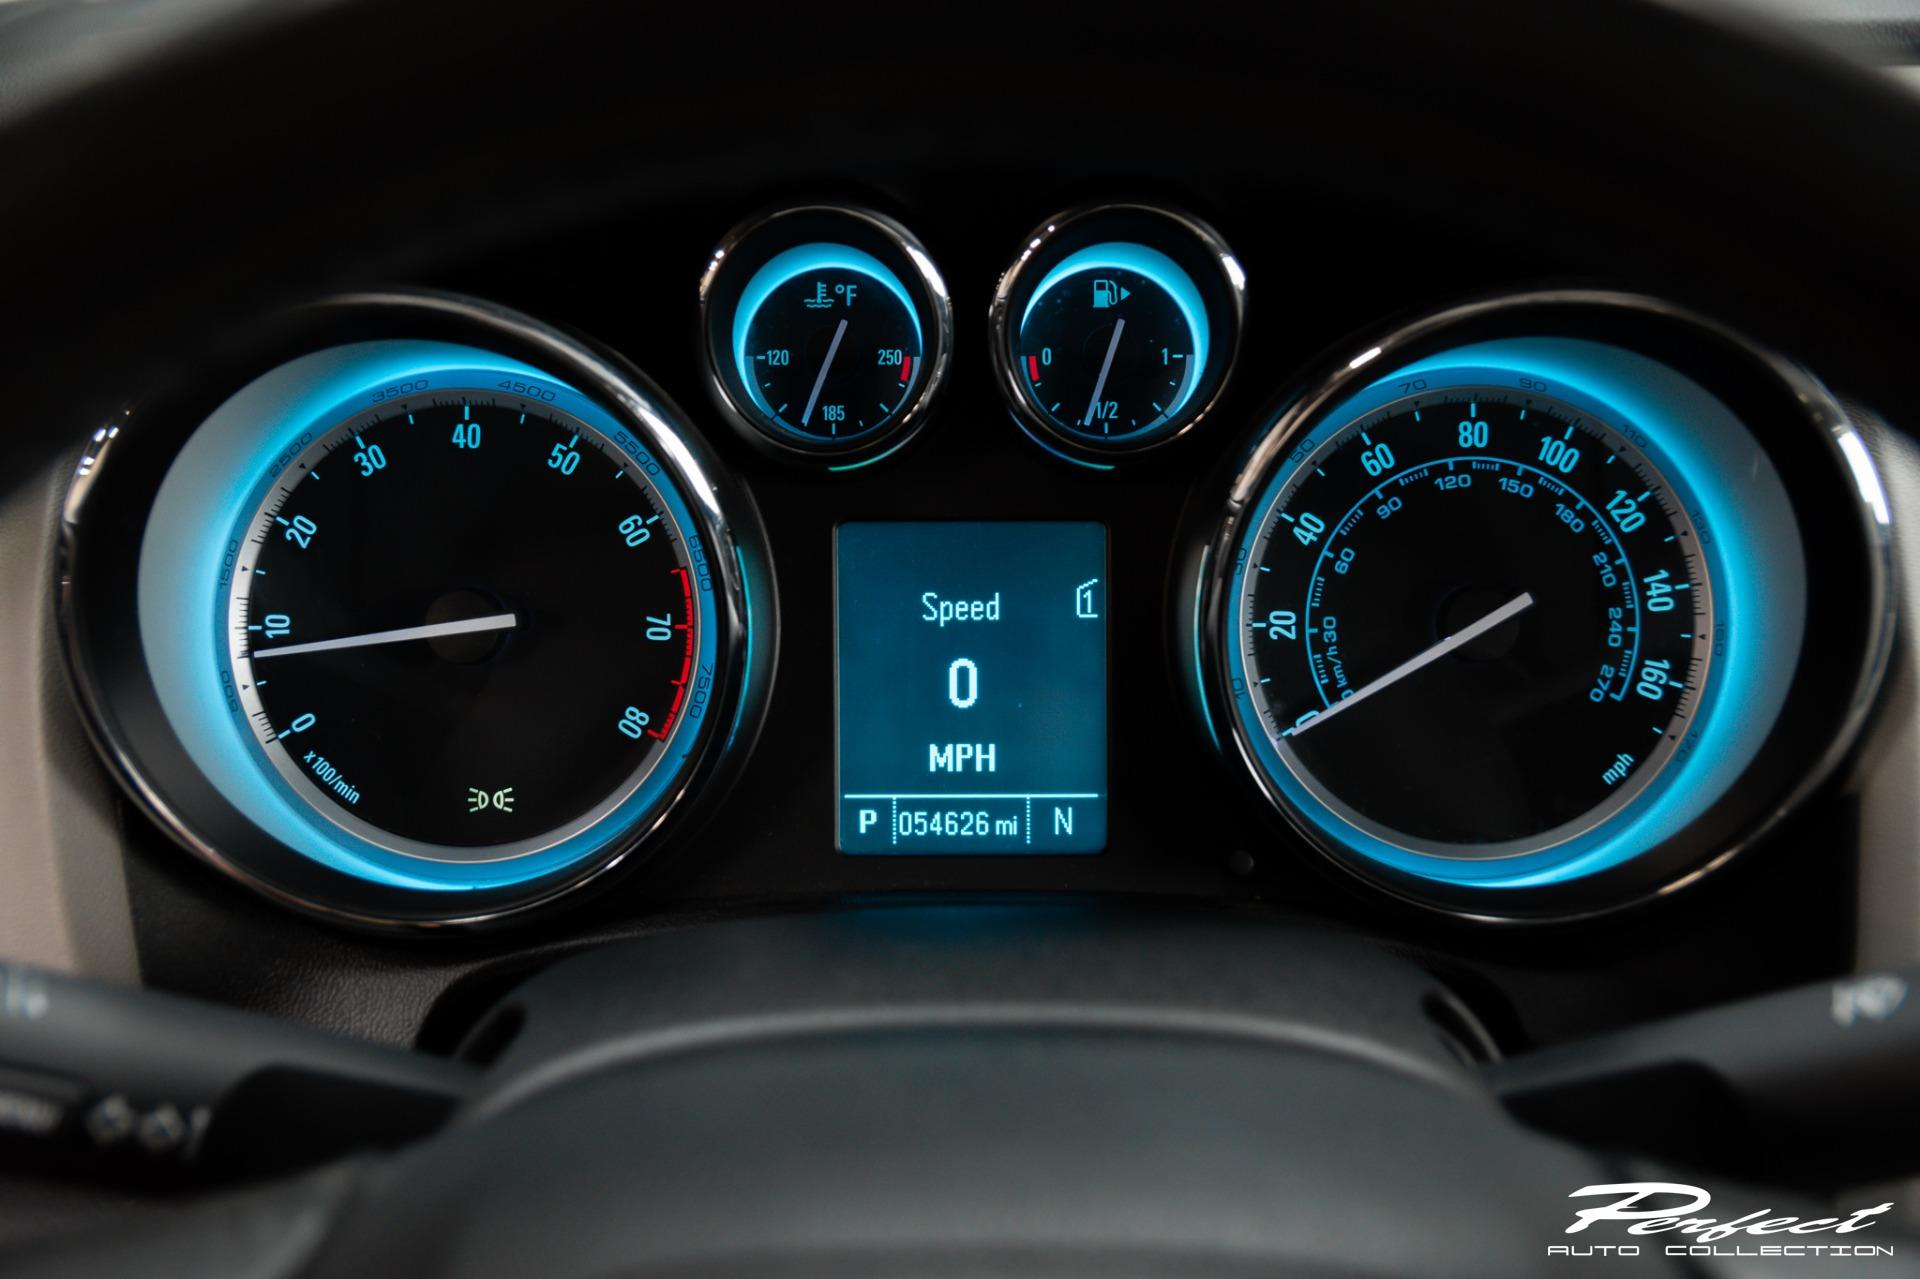 Used 2013 Buick Verano